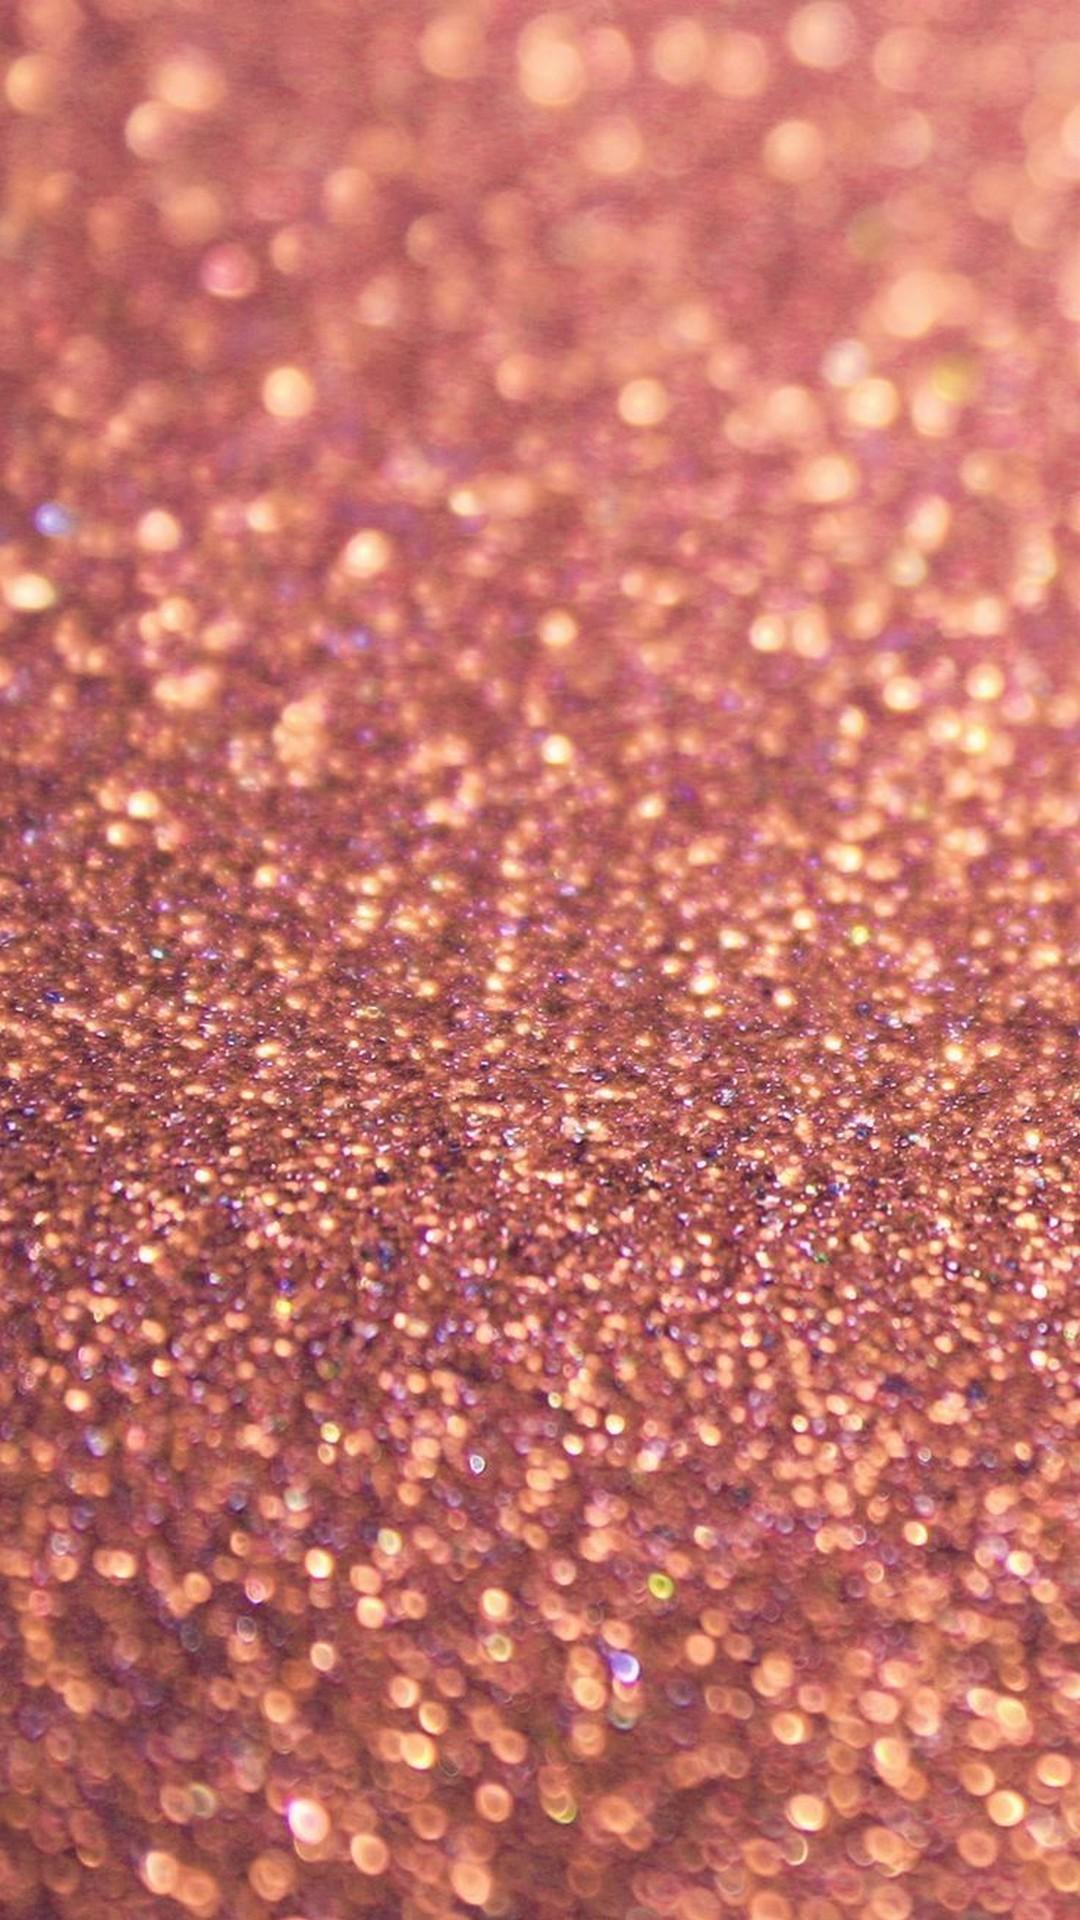 Rose Gold Glitter Wallpaper Iphone Resolution - Rose Gold Iphone Backgrounds - HD Wallpaper